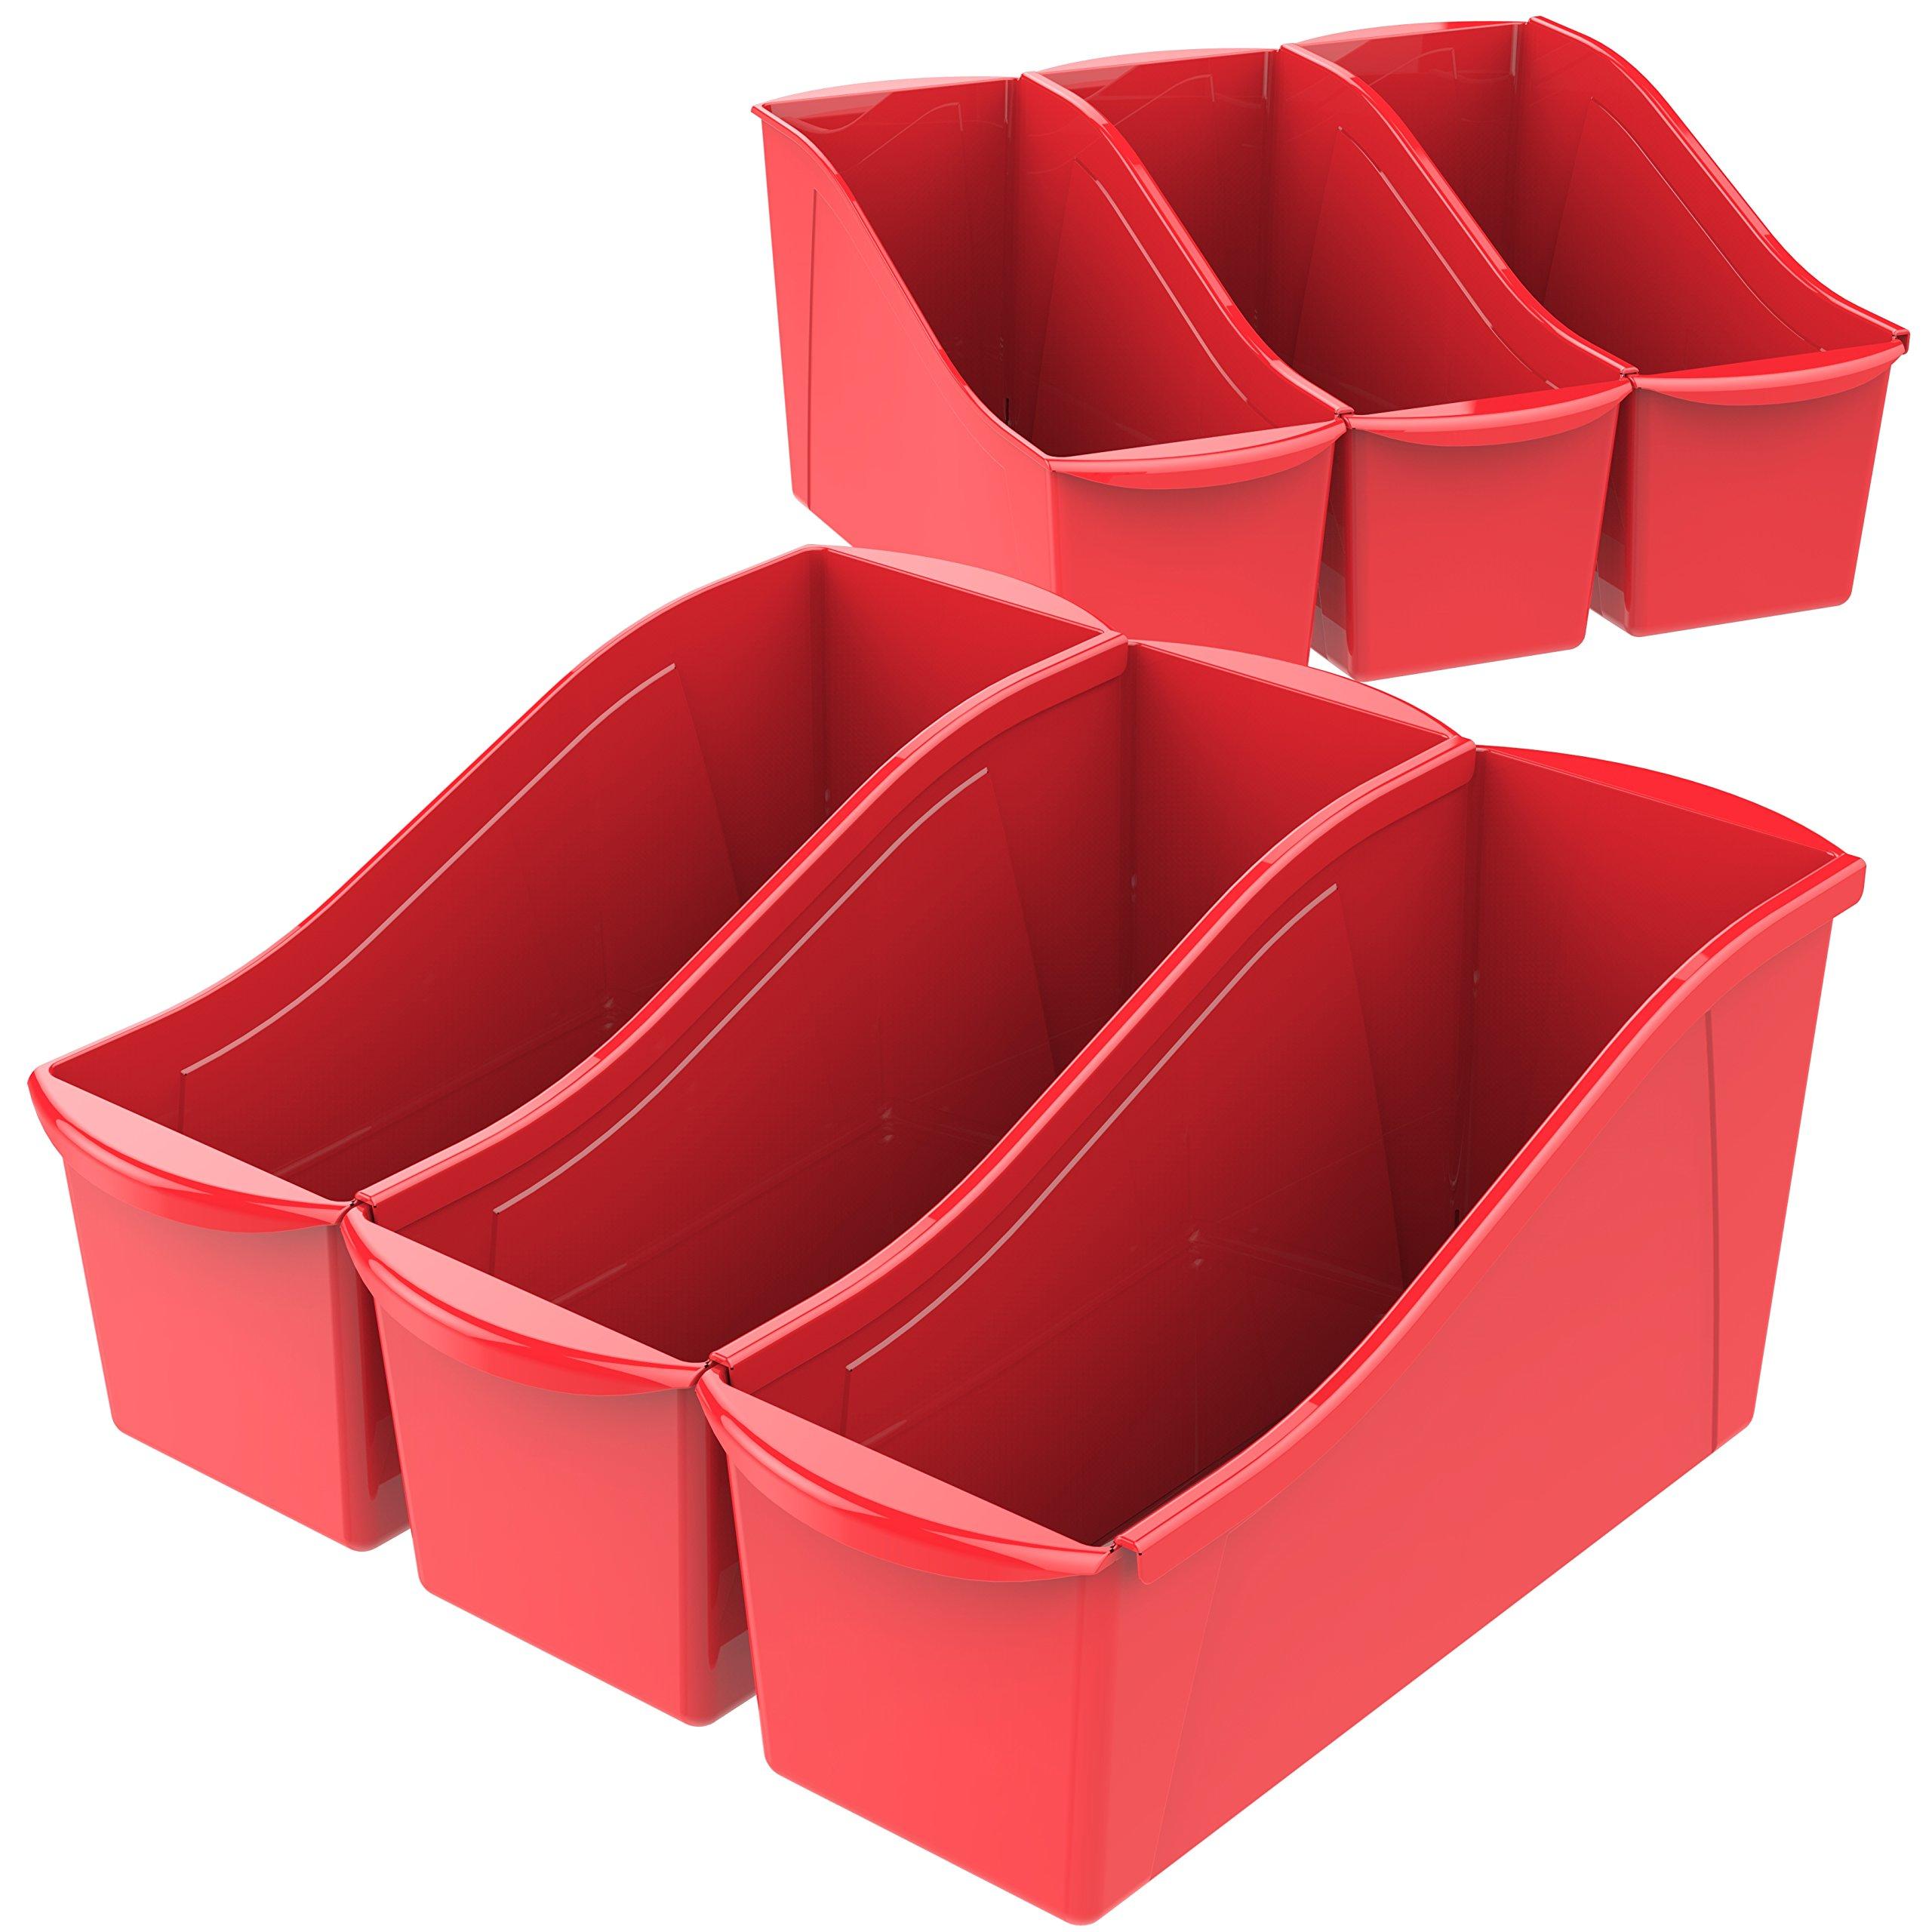 Storex Large Book Bin, 14.3 x 5.3 x 7 Inches, Red, Case of 6 (71116U06C) by Storex